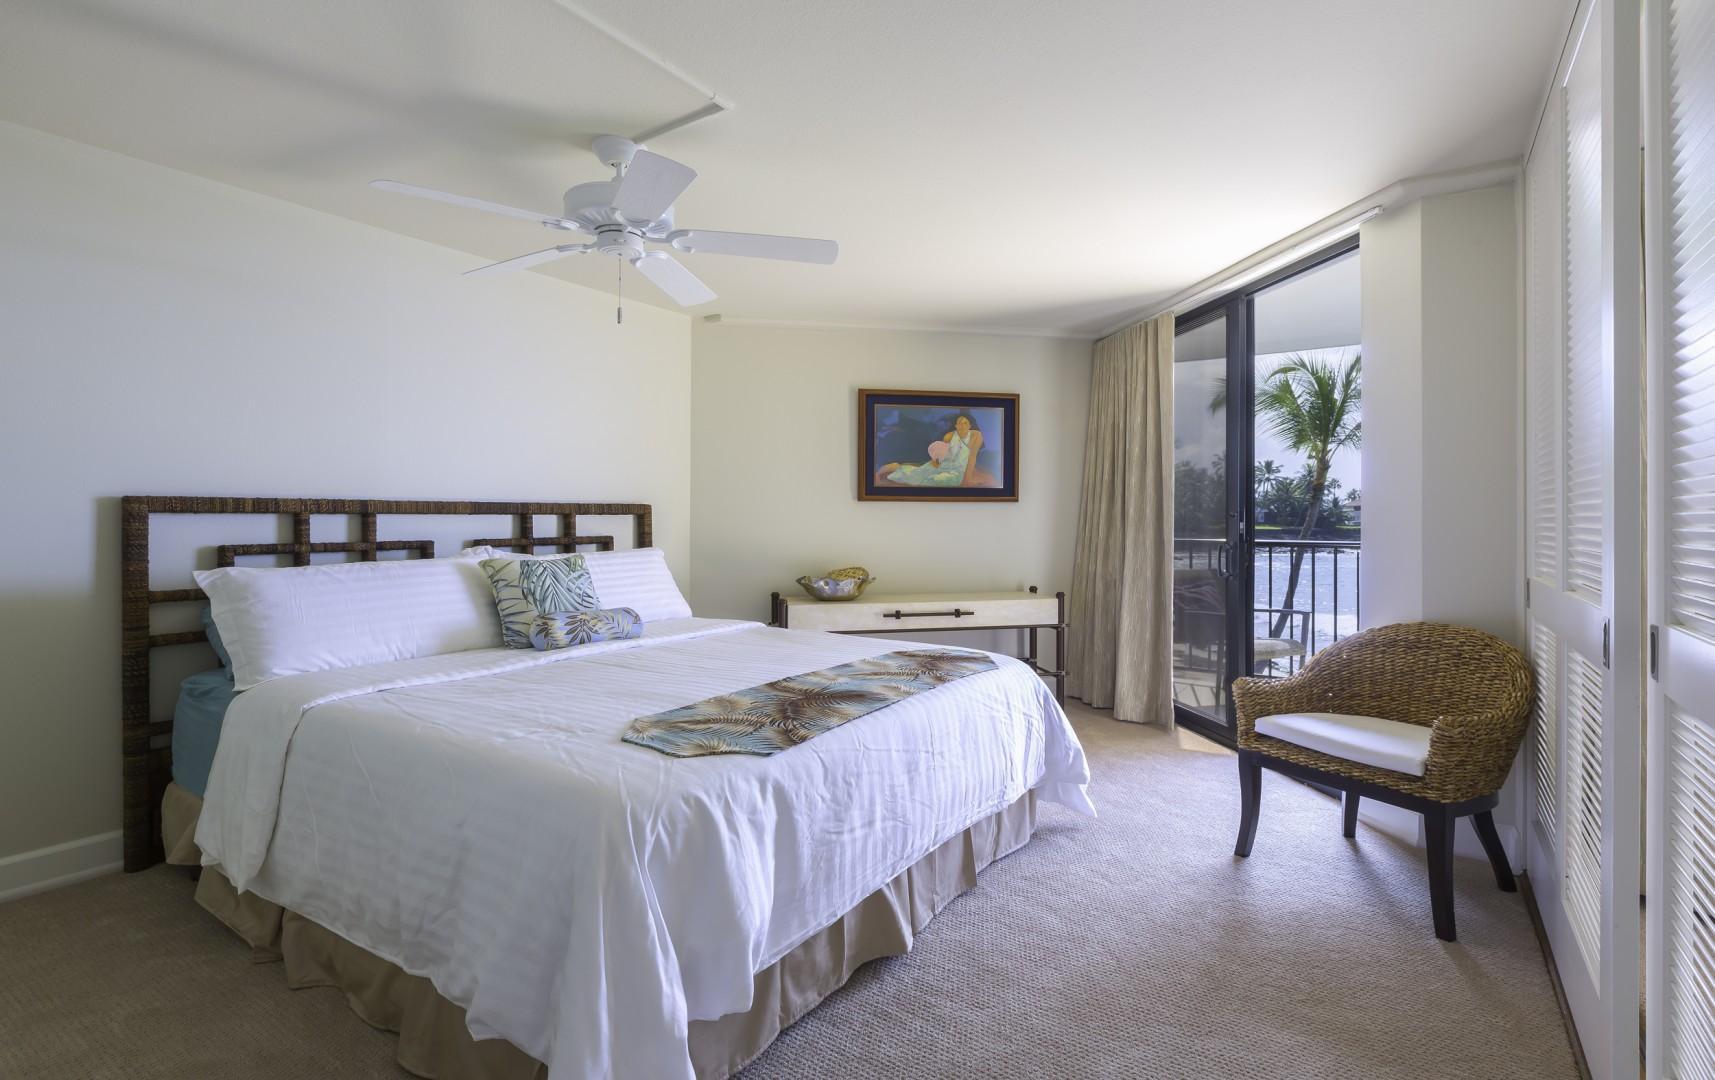 Spacious Master Bedroom with Lanai Views